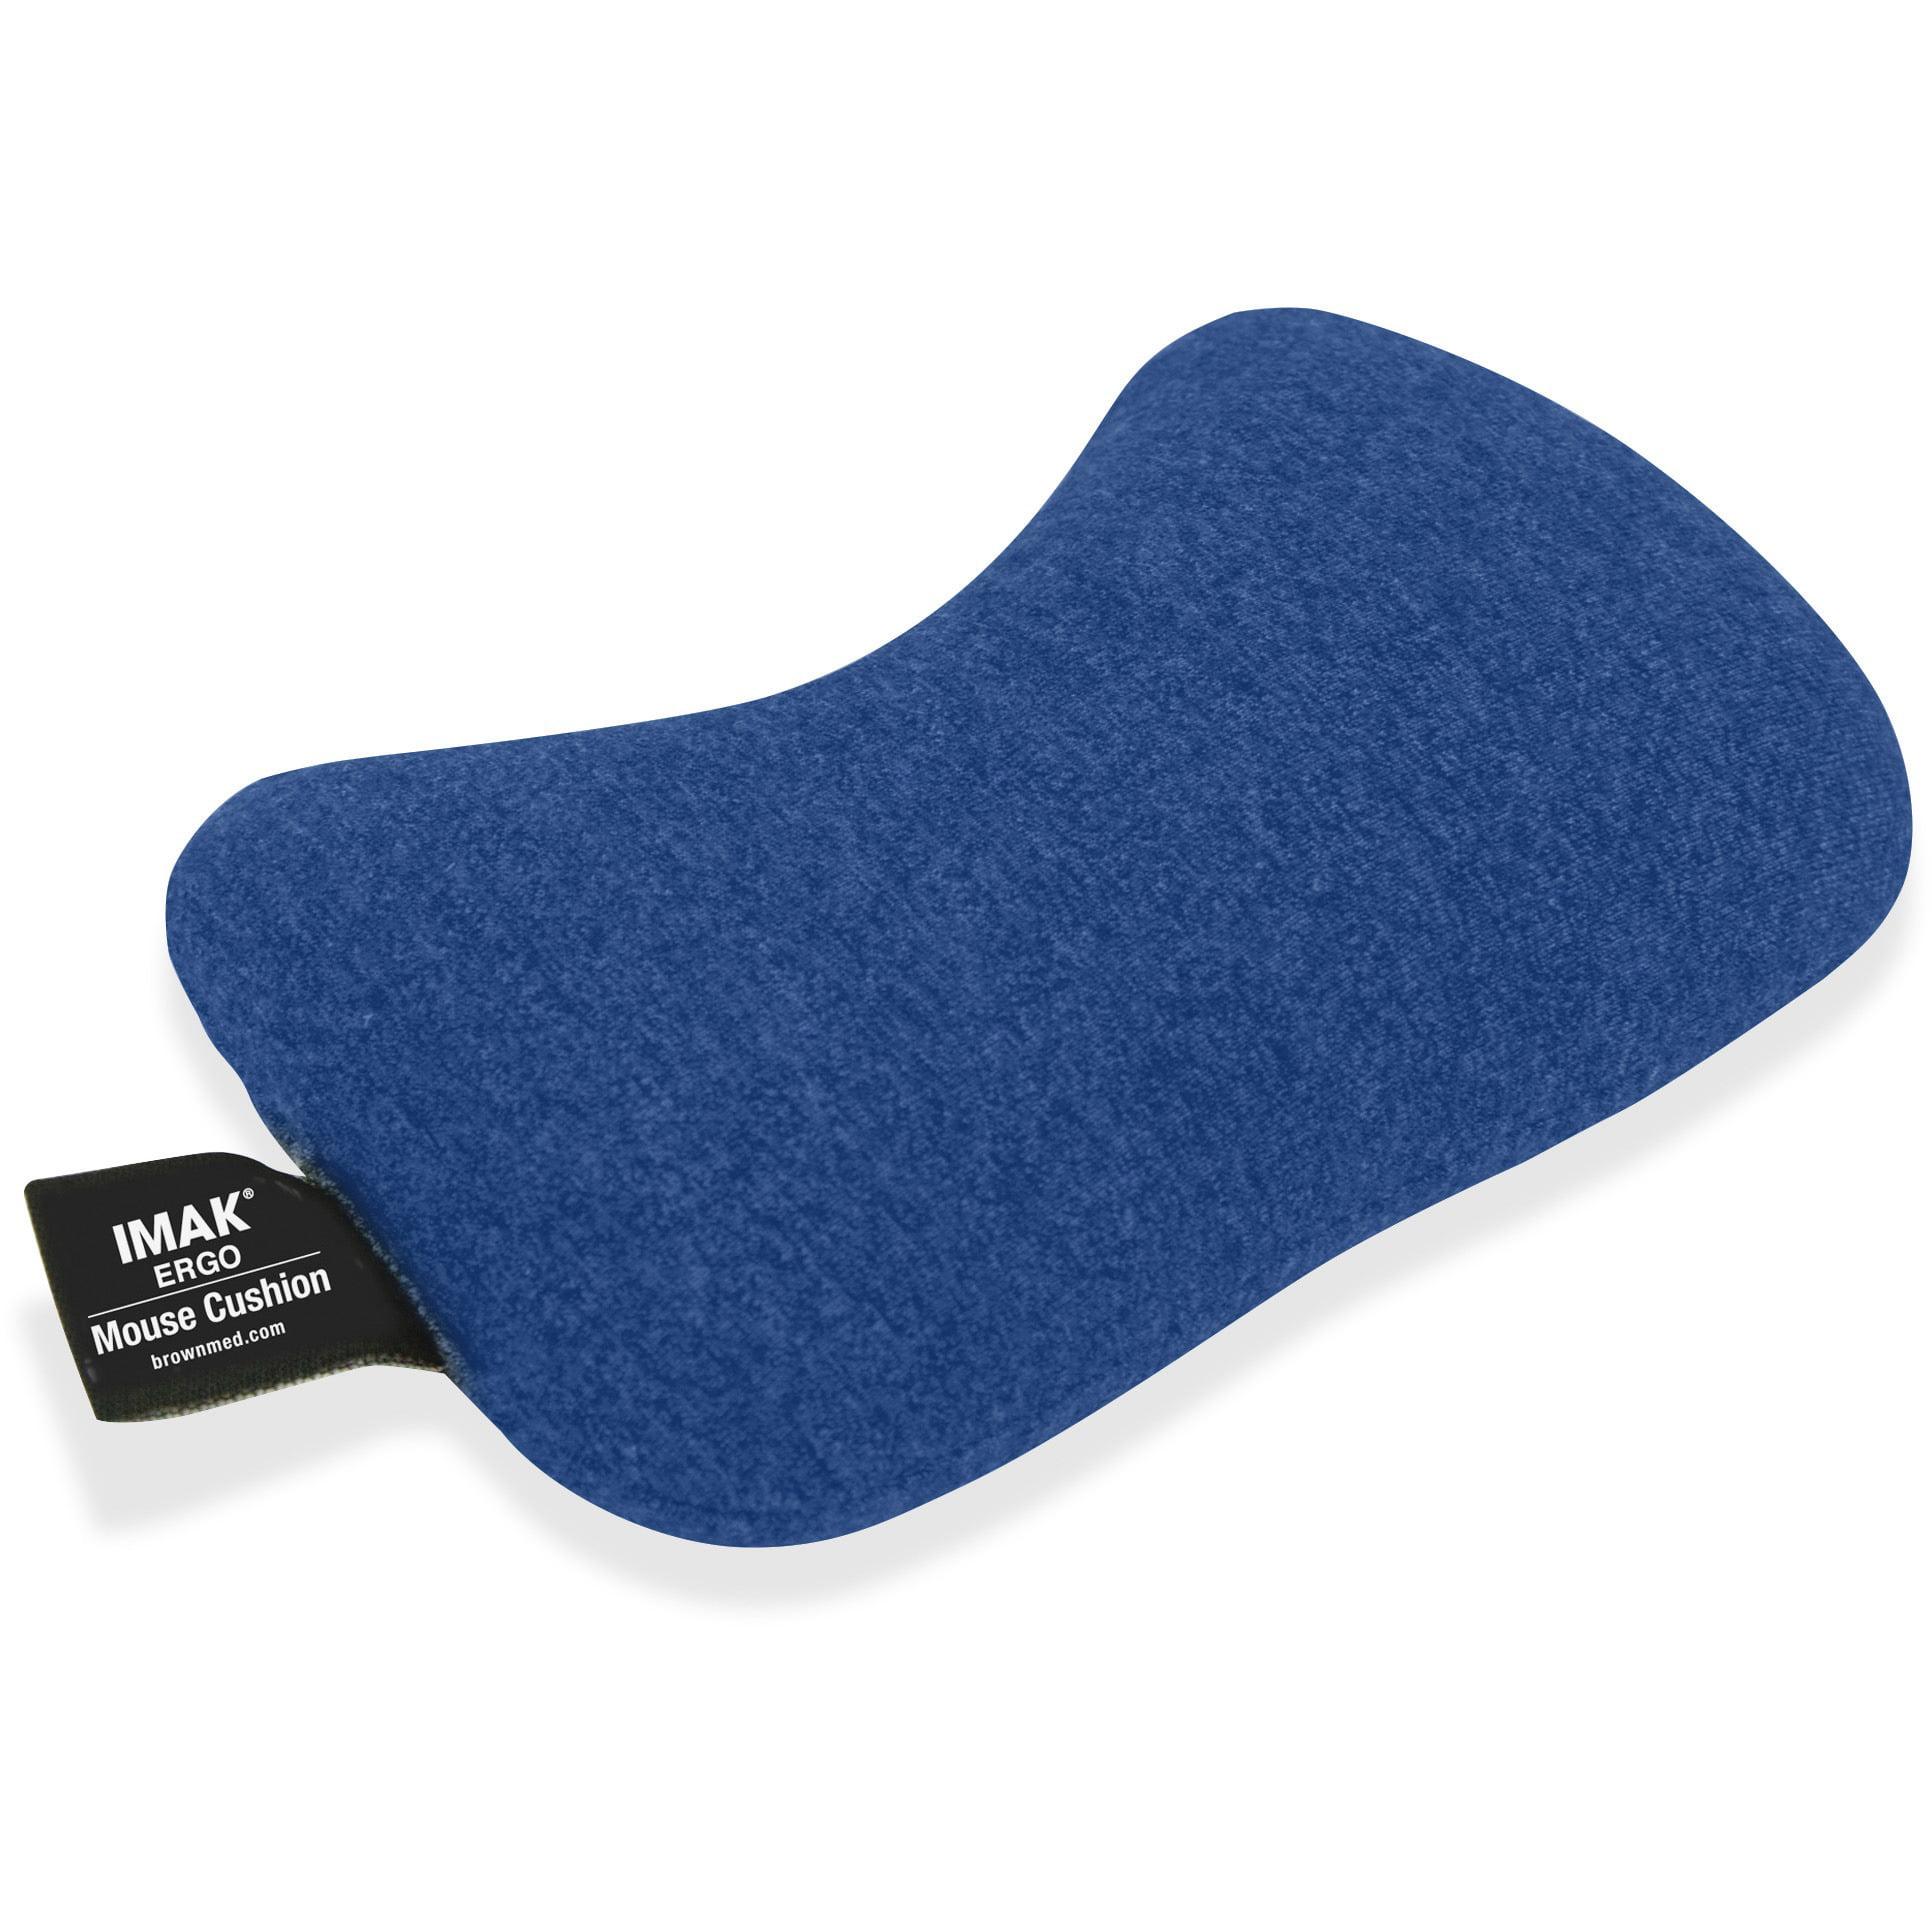 IMAK Mouse Wrist Cushion, Black